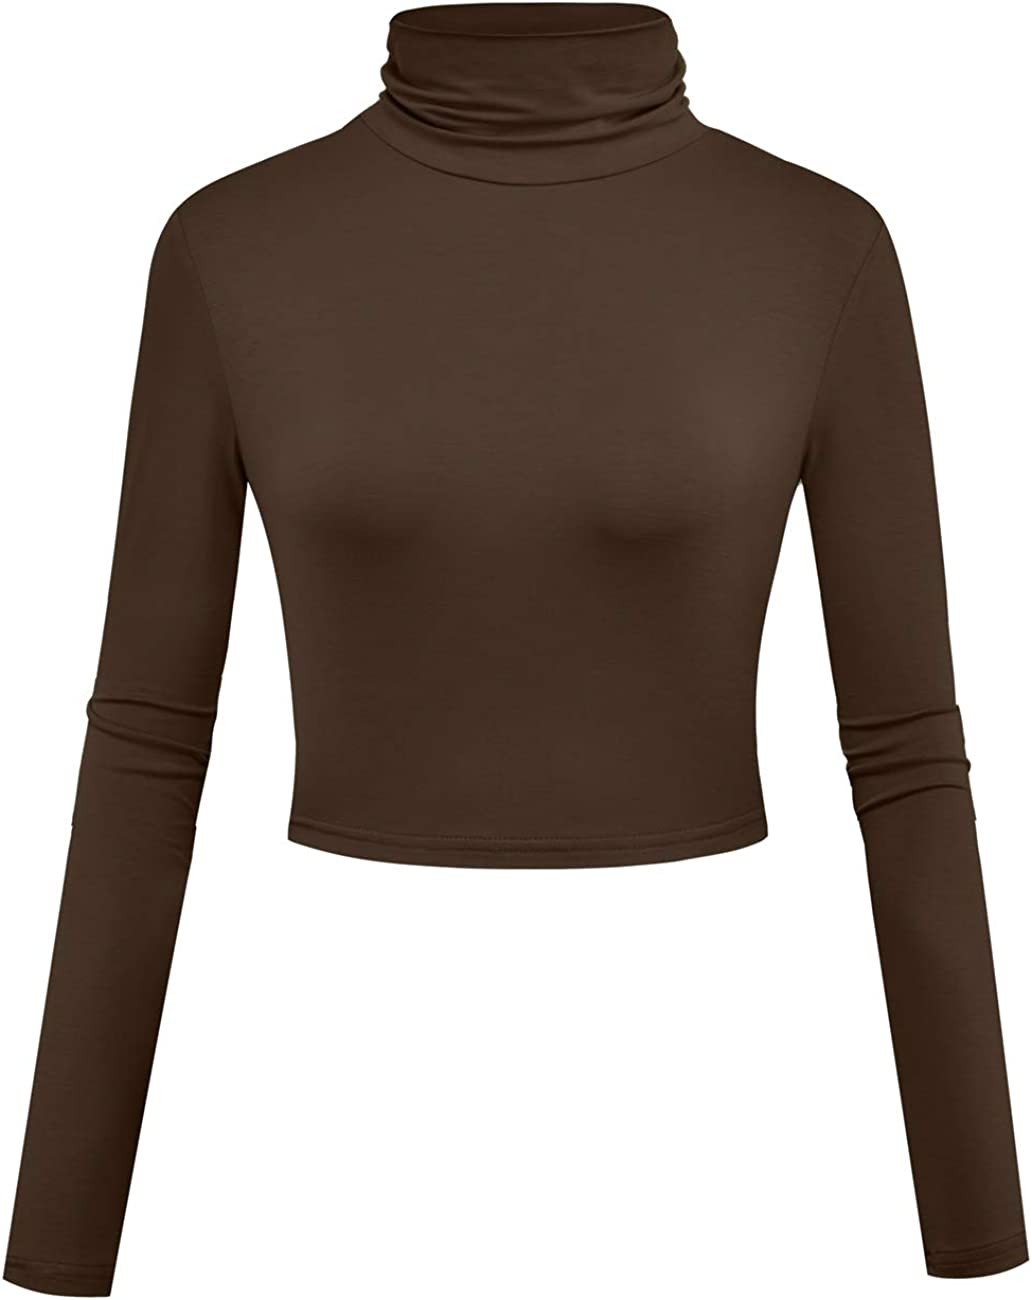 Herou Women Super popular Indefinitely specialty store Long Sleeve Crop Top Soft Turtleneck Lightweight Bas